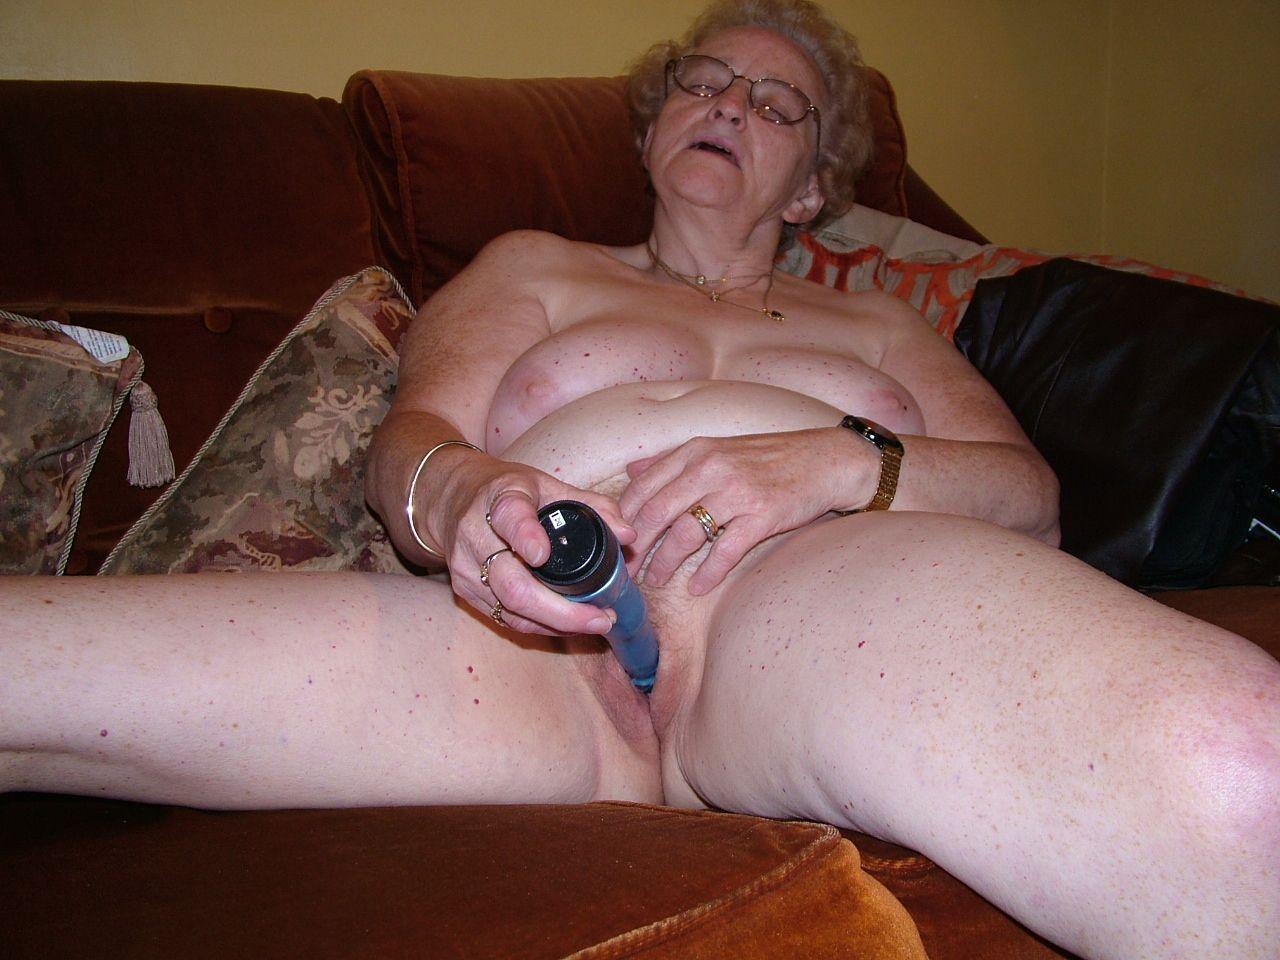 hot omageil granny mix 70 + <b>GRANDMA</b> ALONE AT HOME